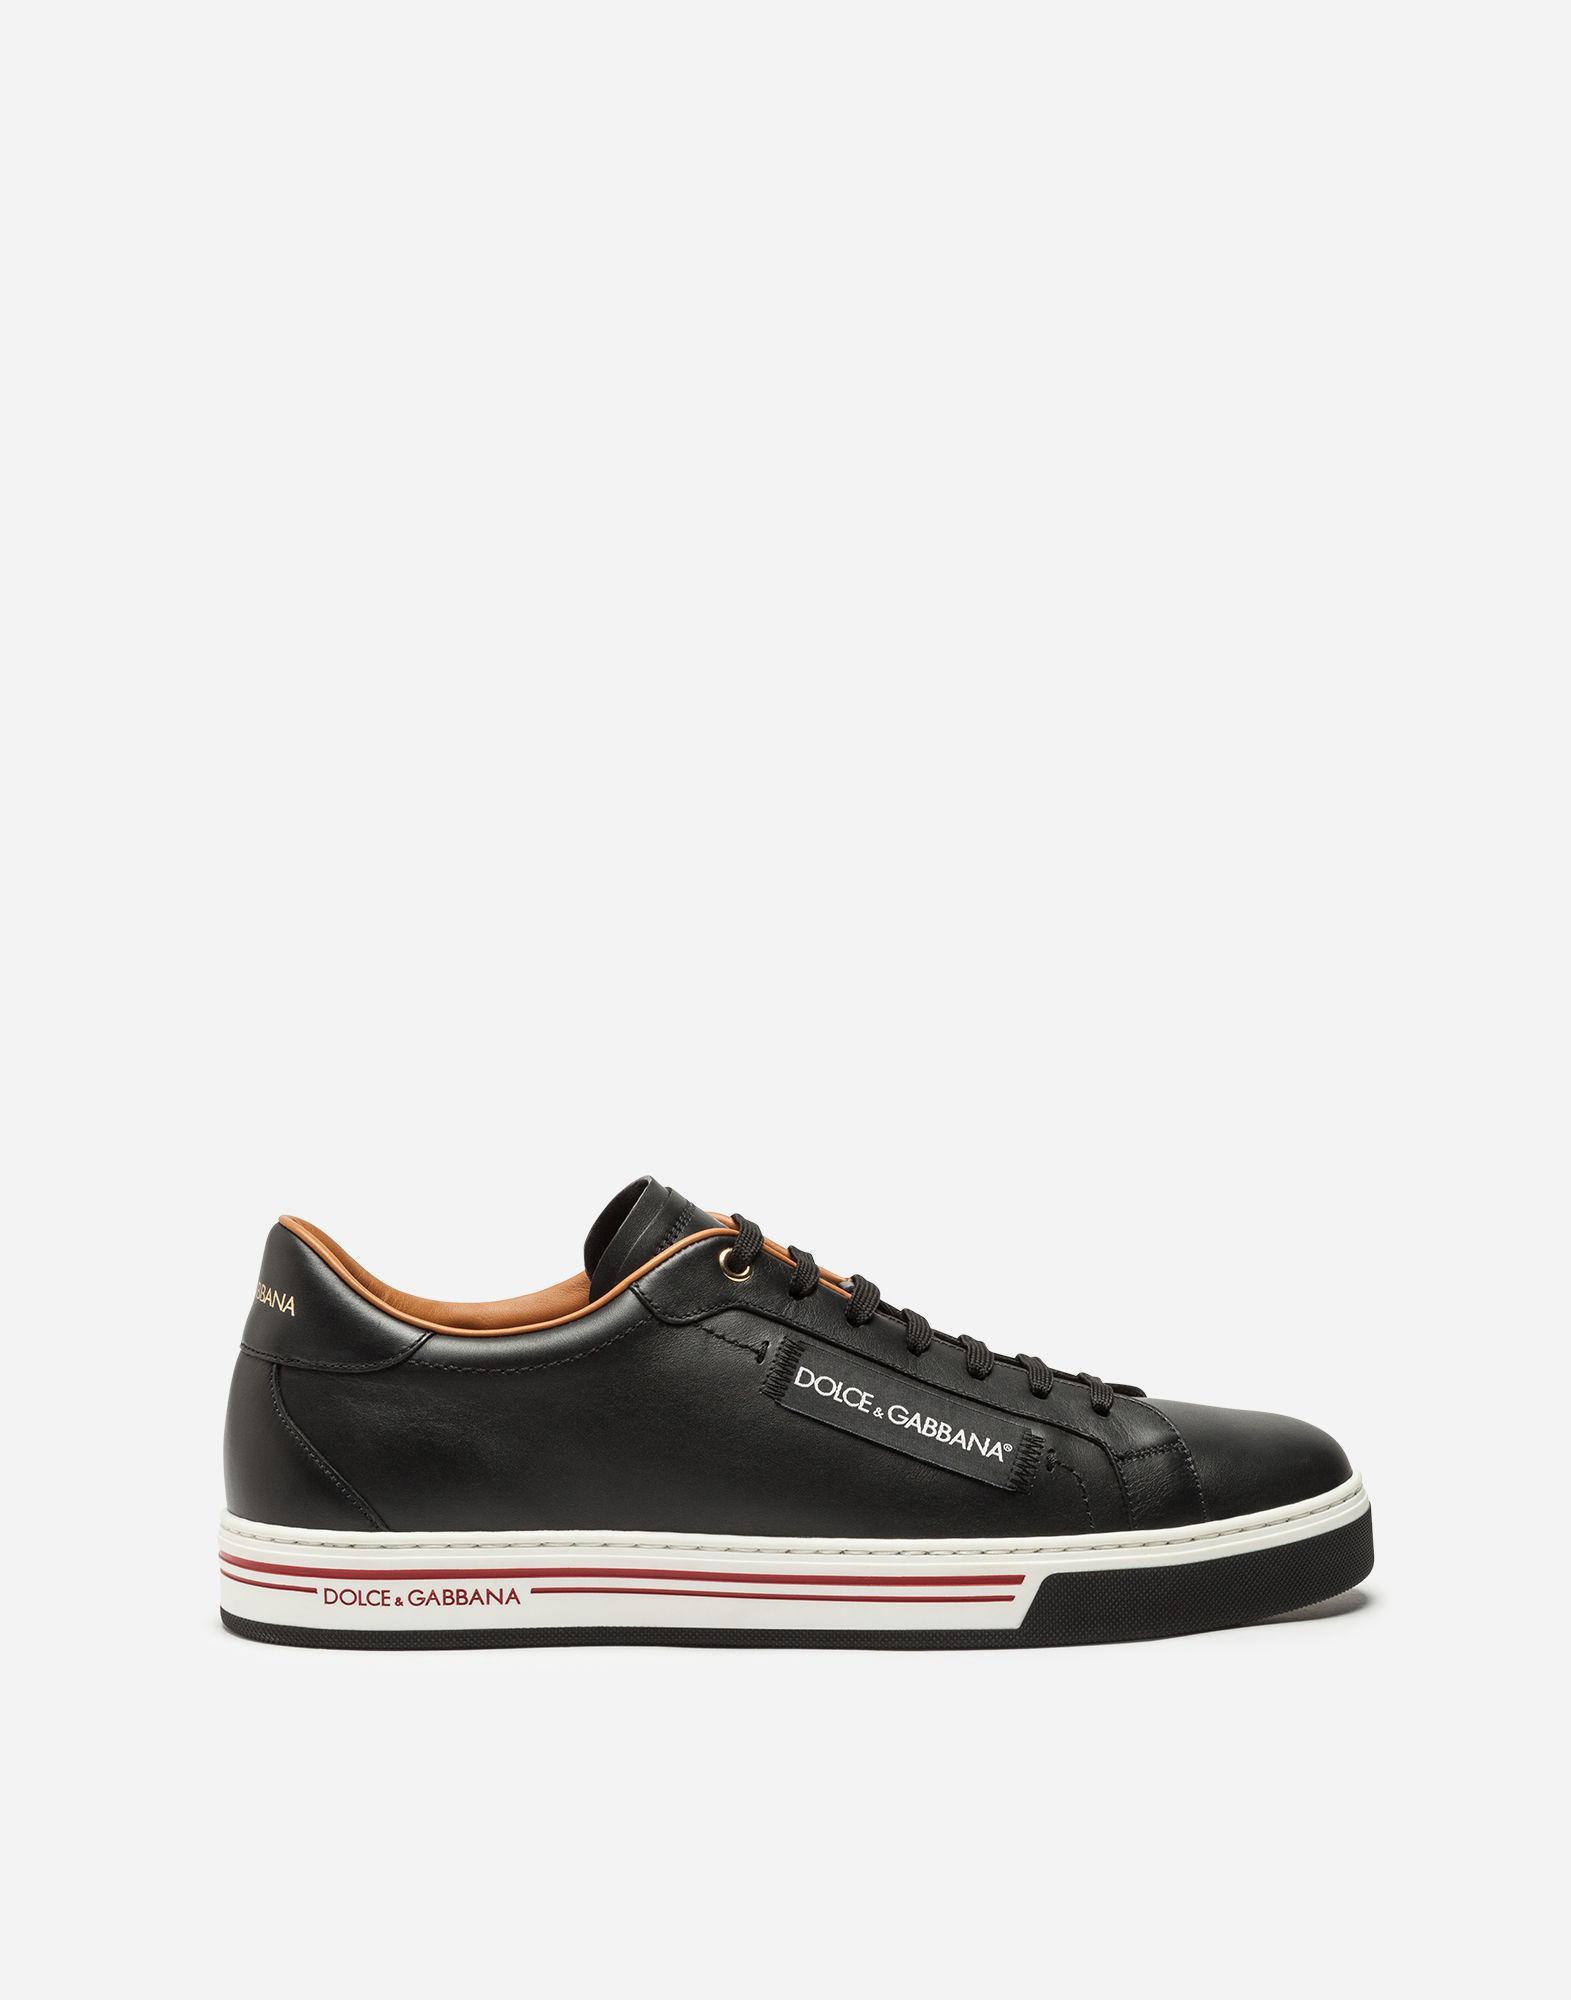 Dolce & Gabbana Calfskin Nappa Sneakers 1paBmA7a6